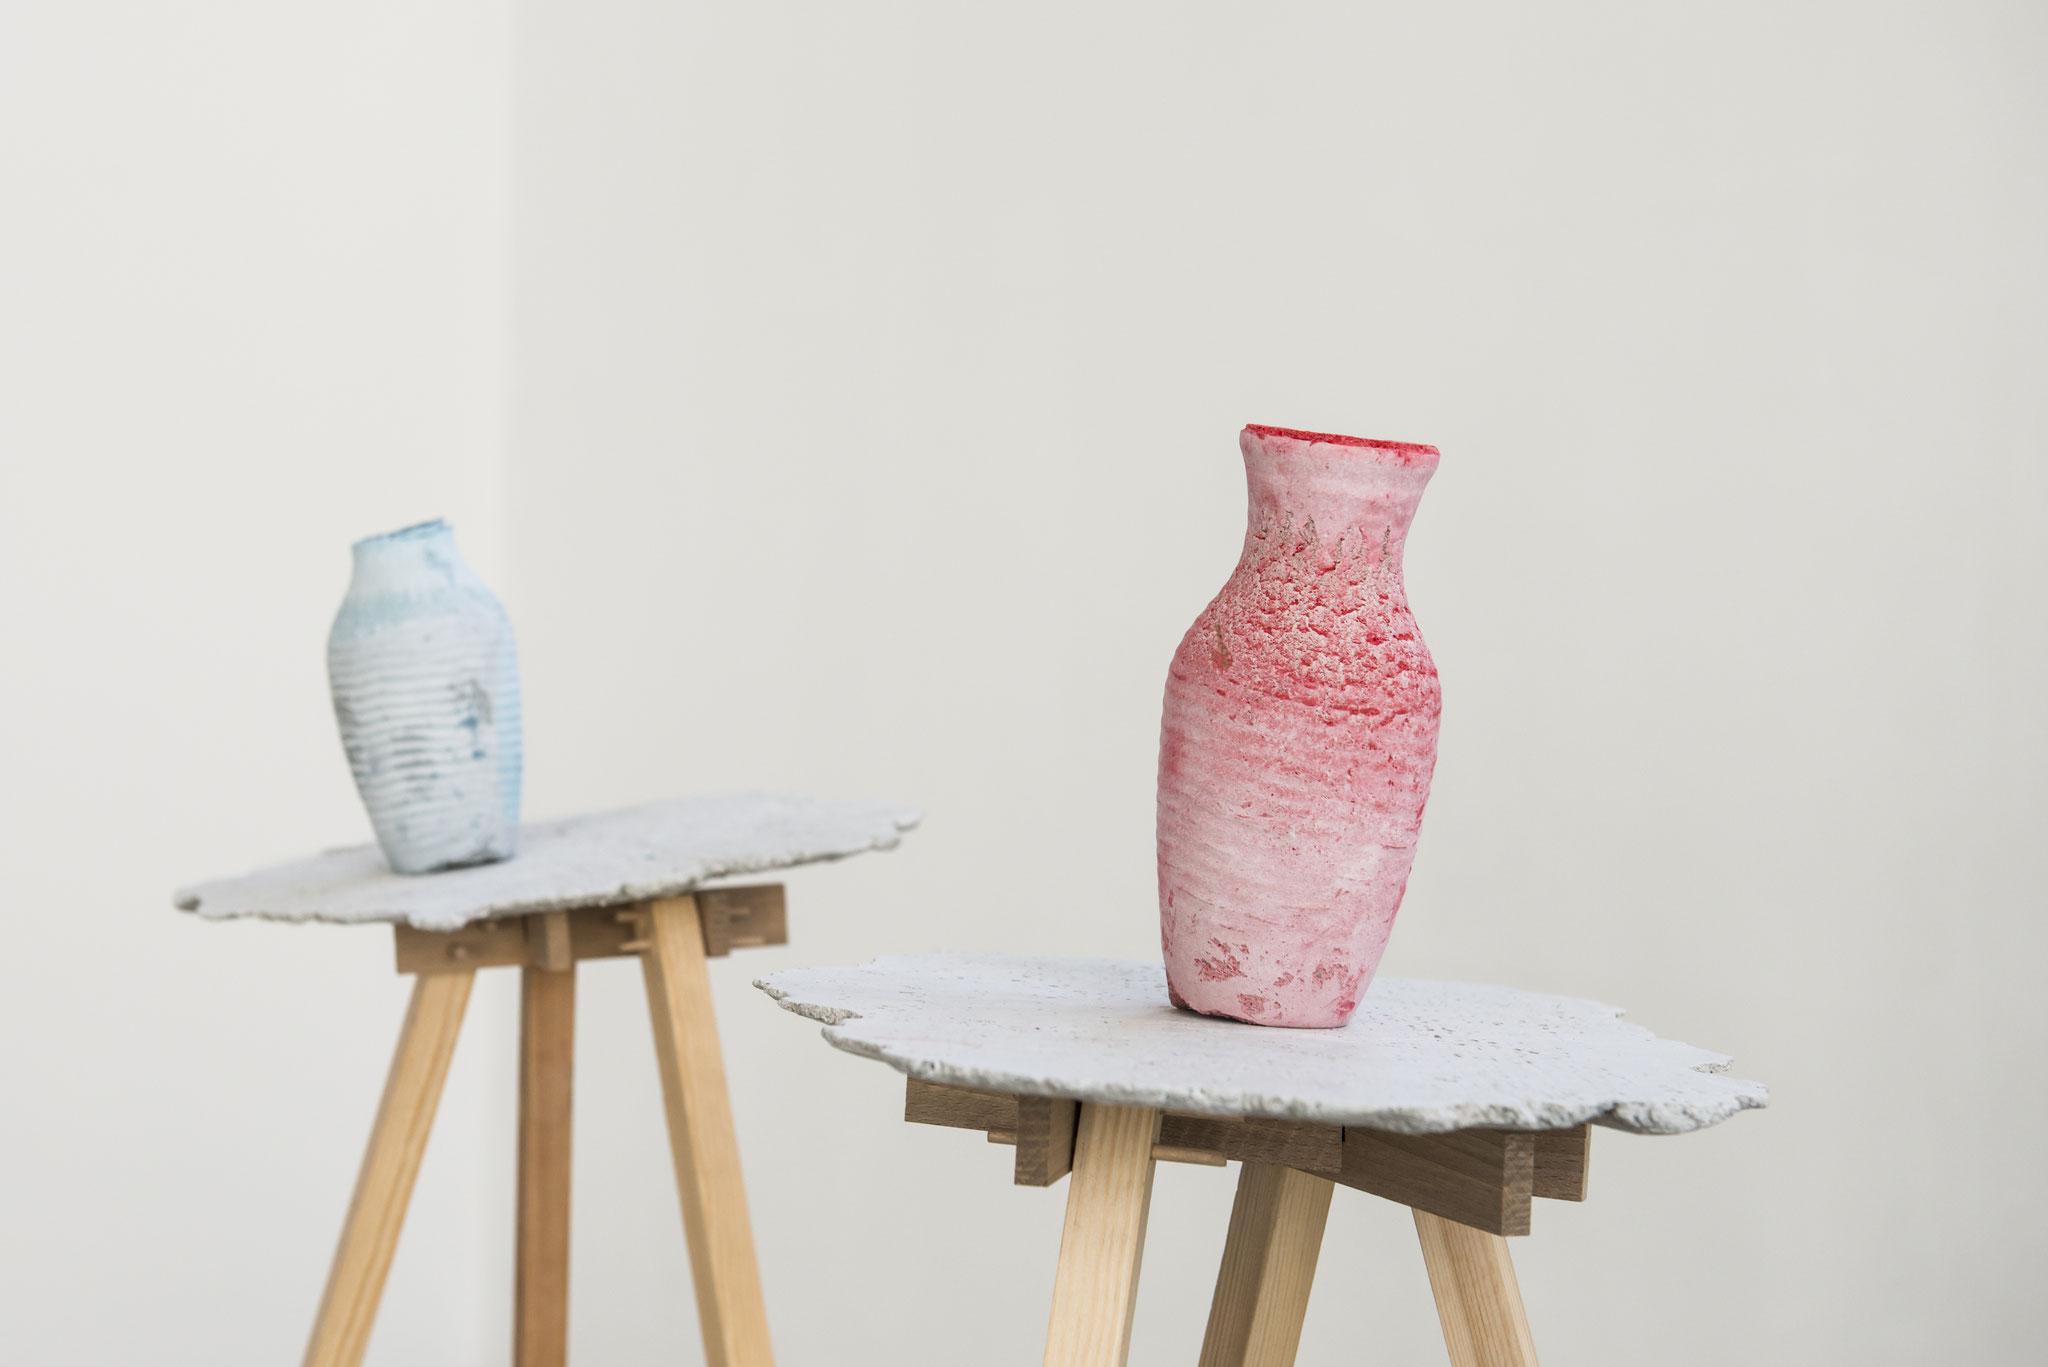 Frau und Herr Blume_Beton, Pigment, Gewebe, Holz_150 x 200 x 60 cm_2018_Foto: Gabi Rottes